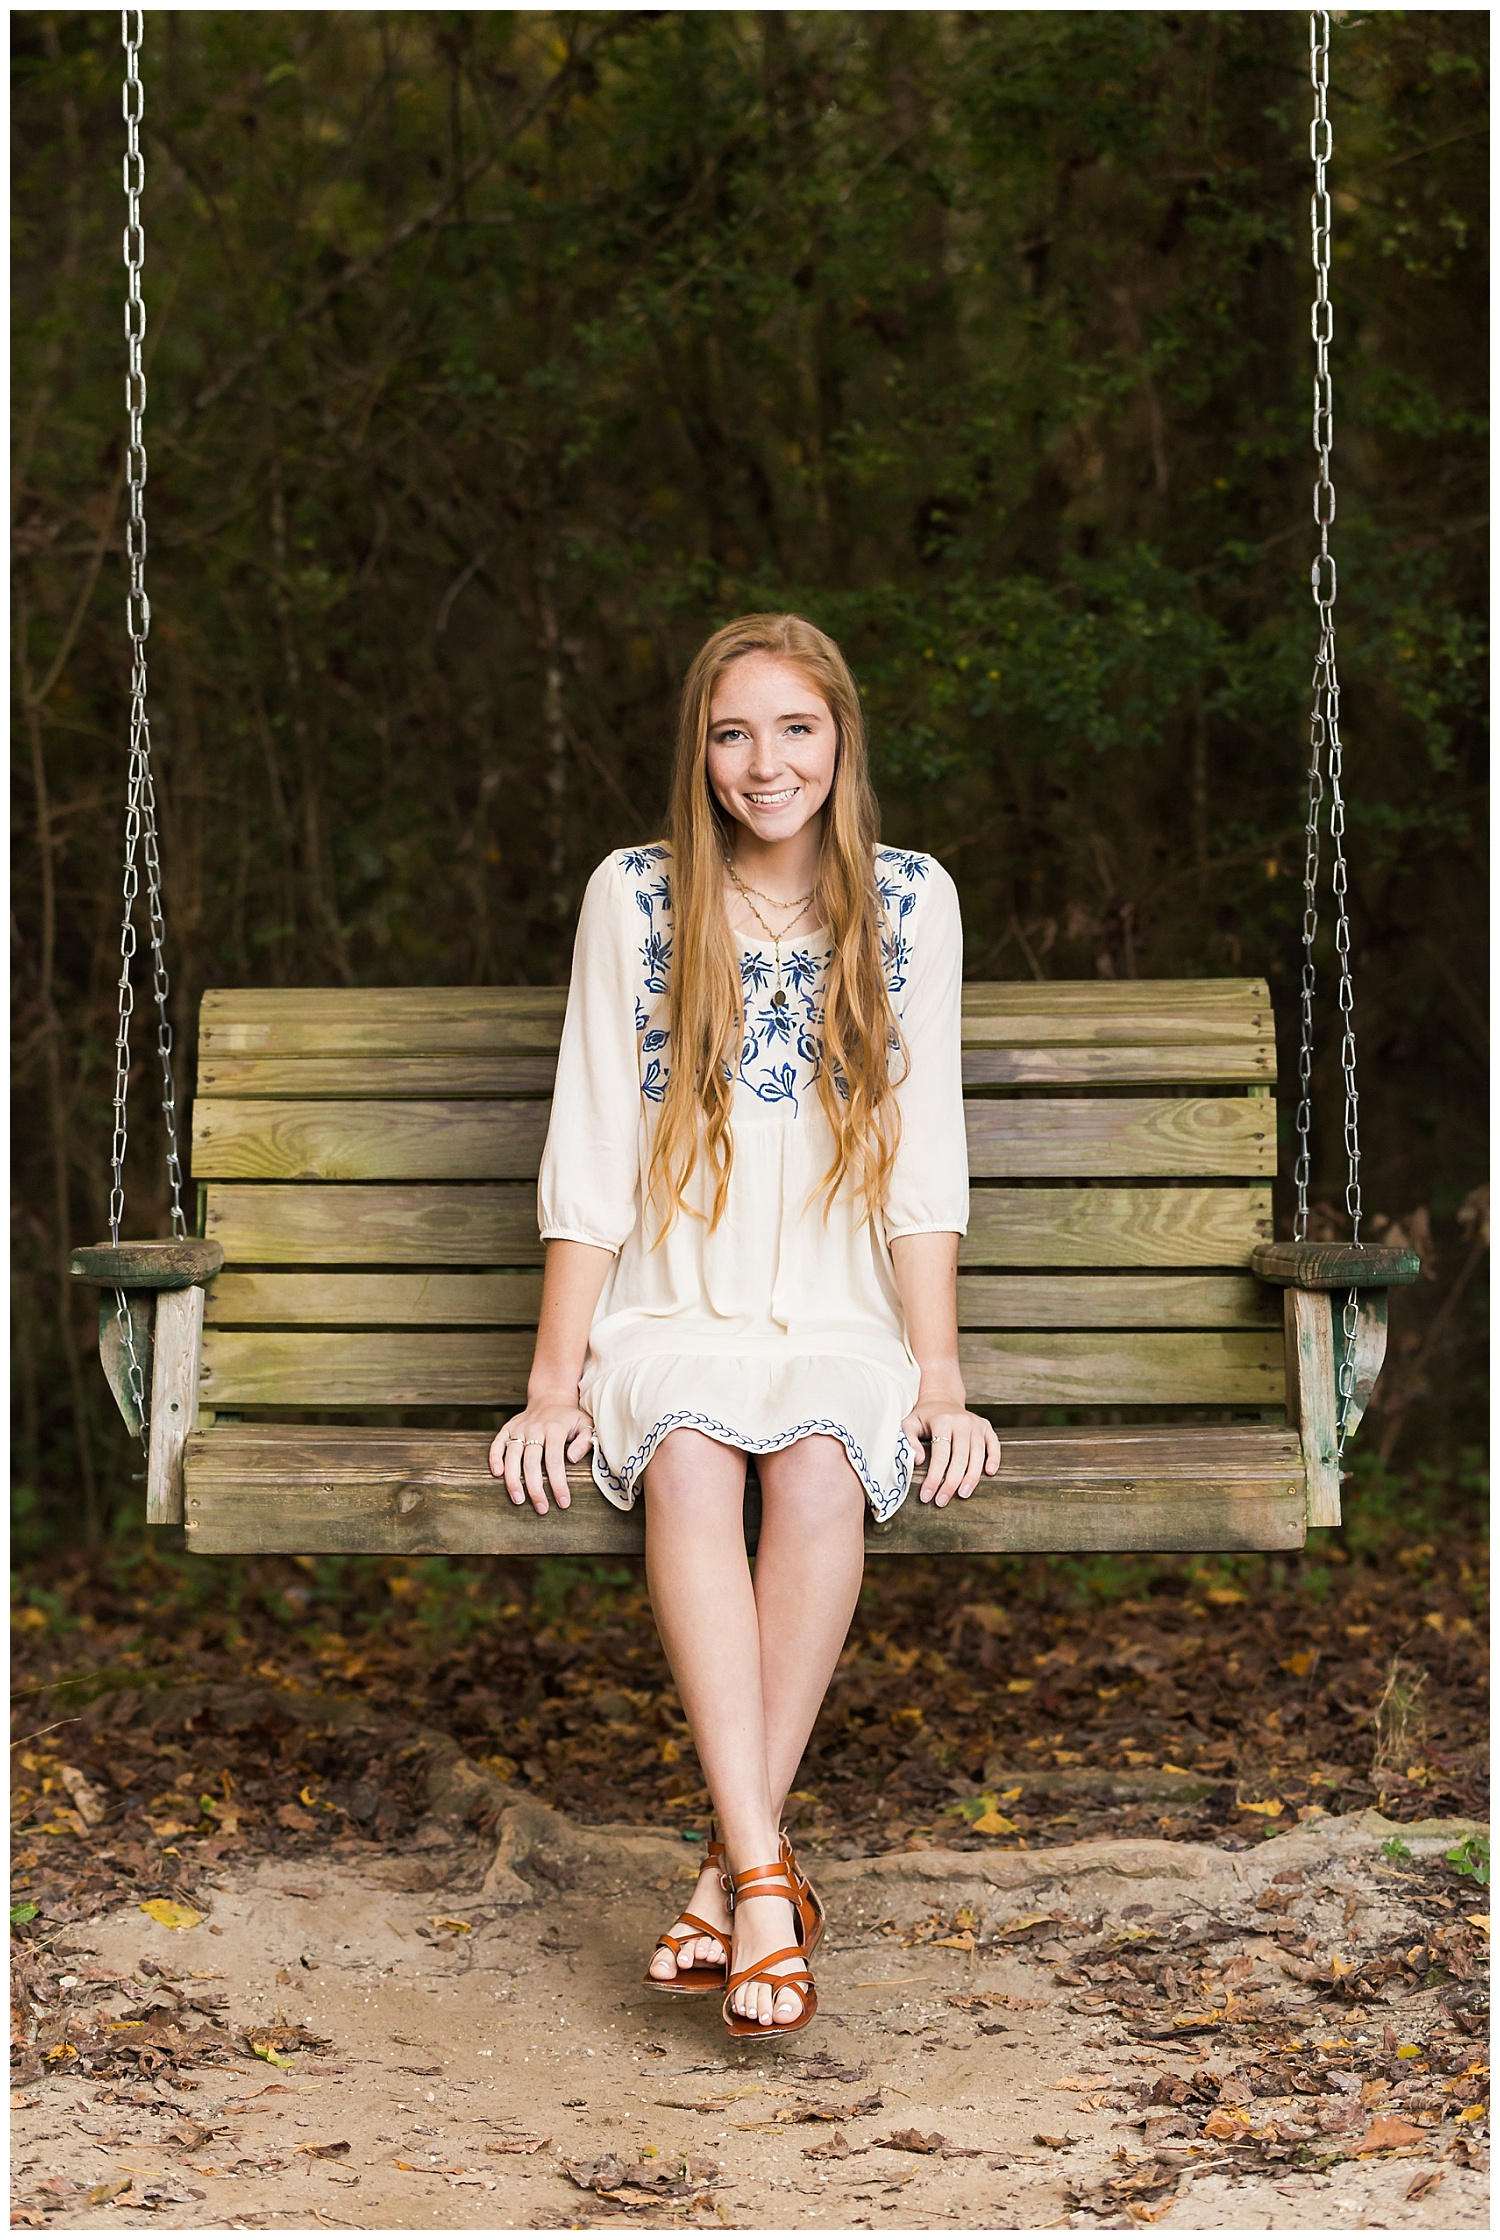 porch swing senior portraits auburn alabama lbeesleyphoto